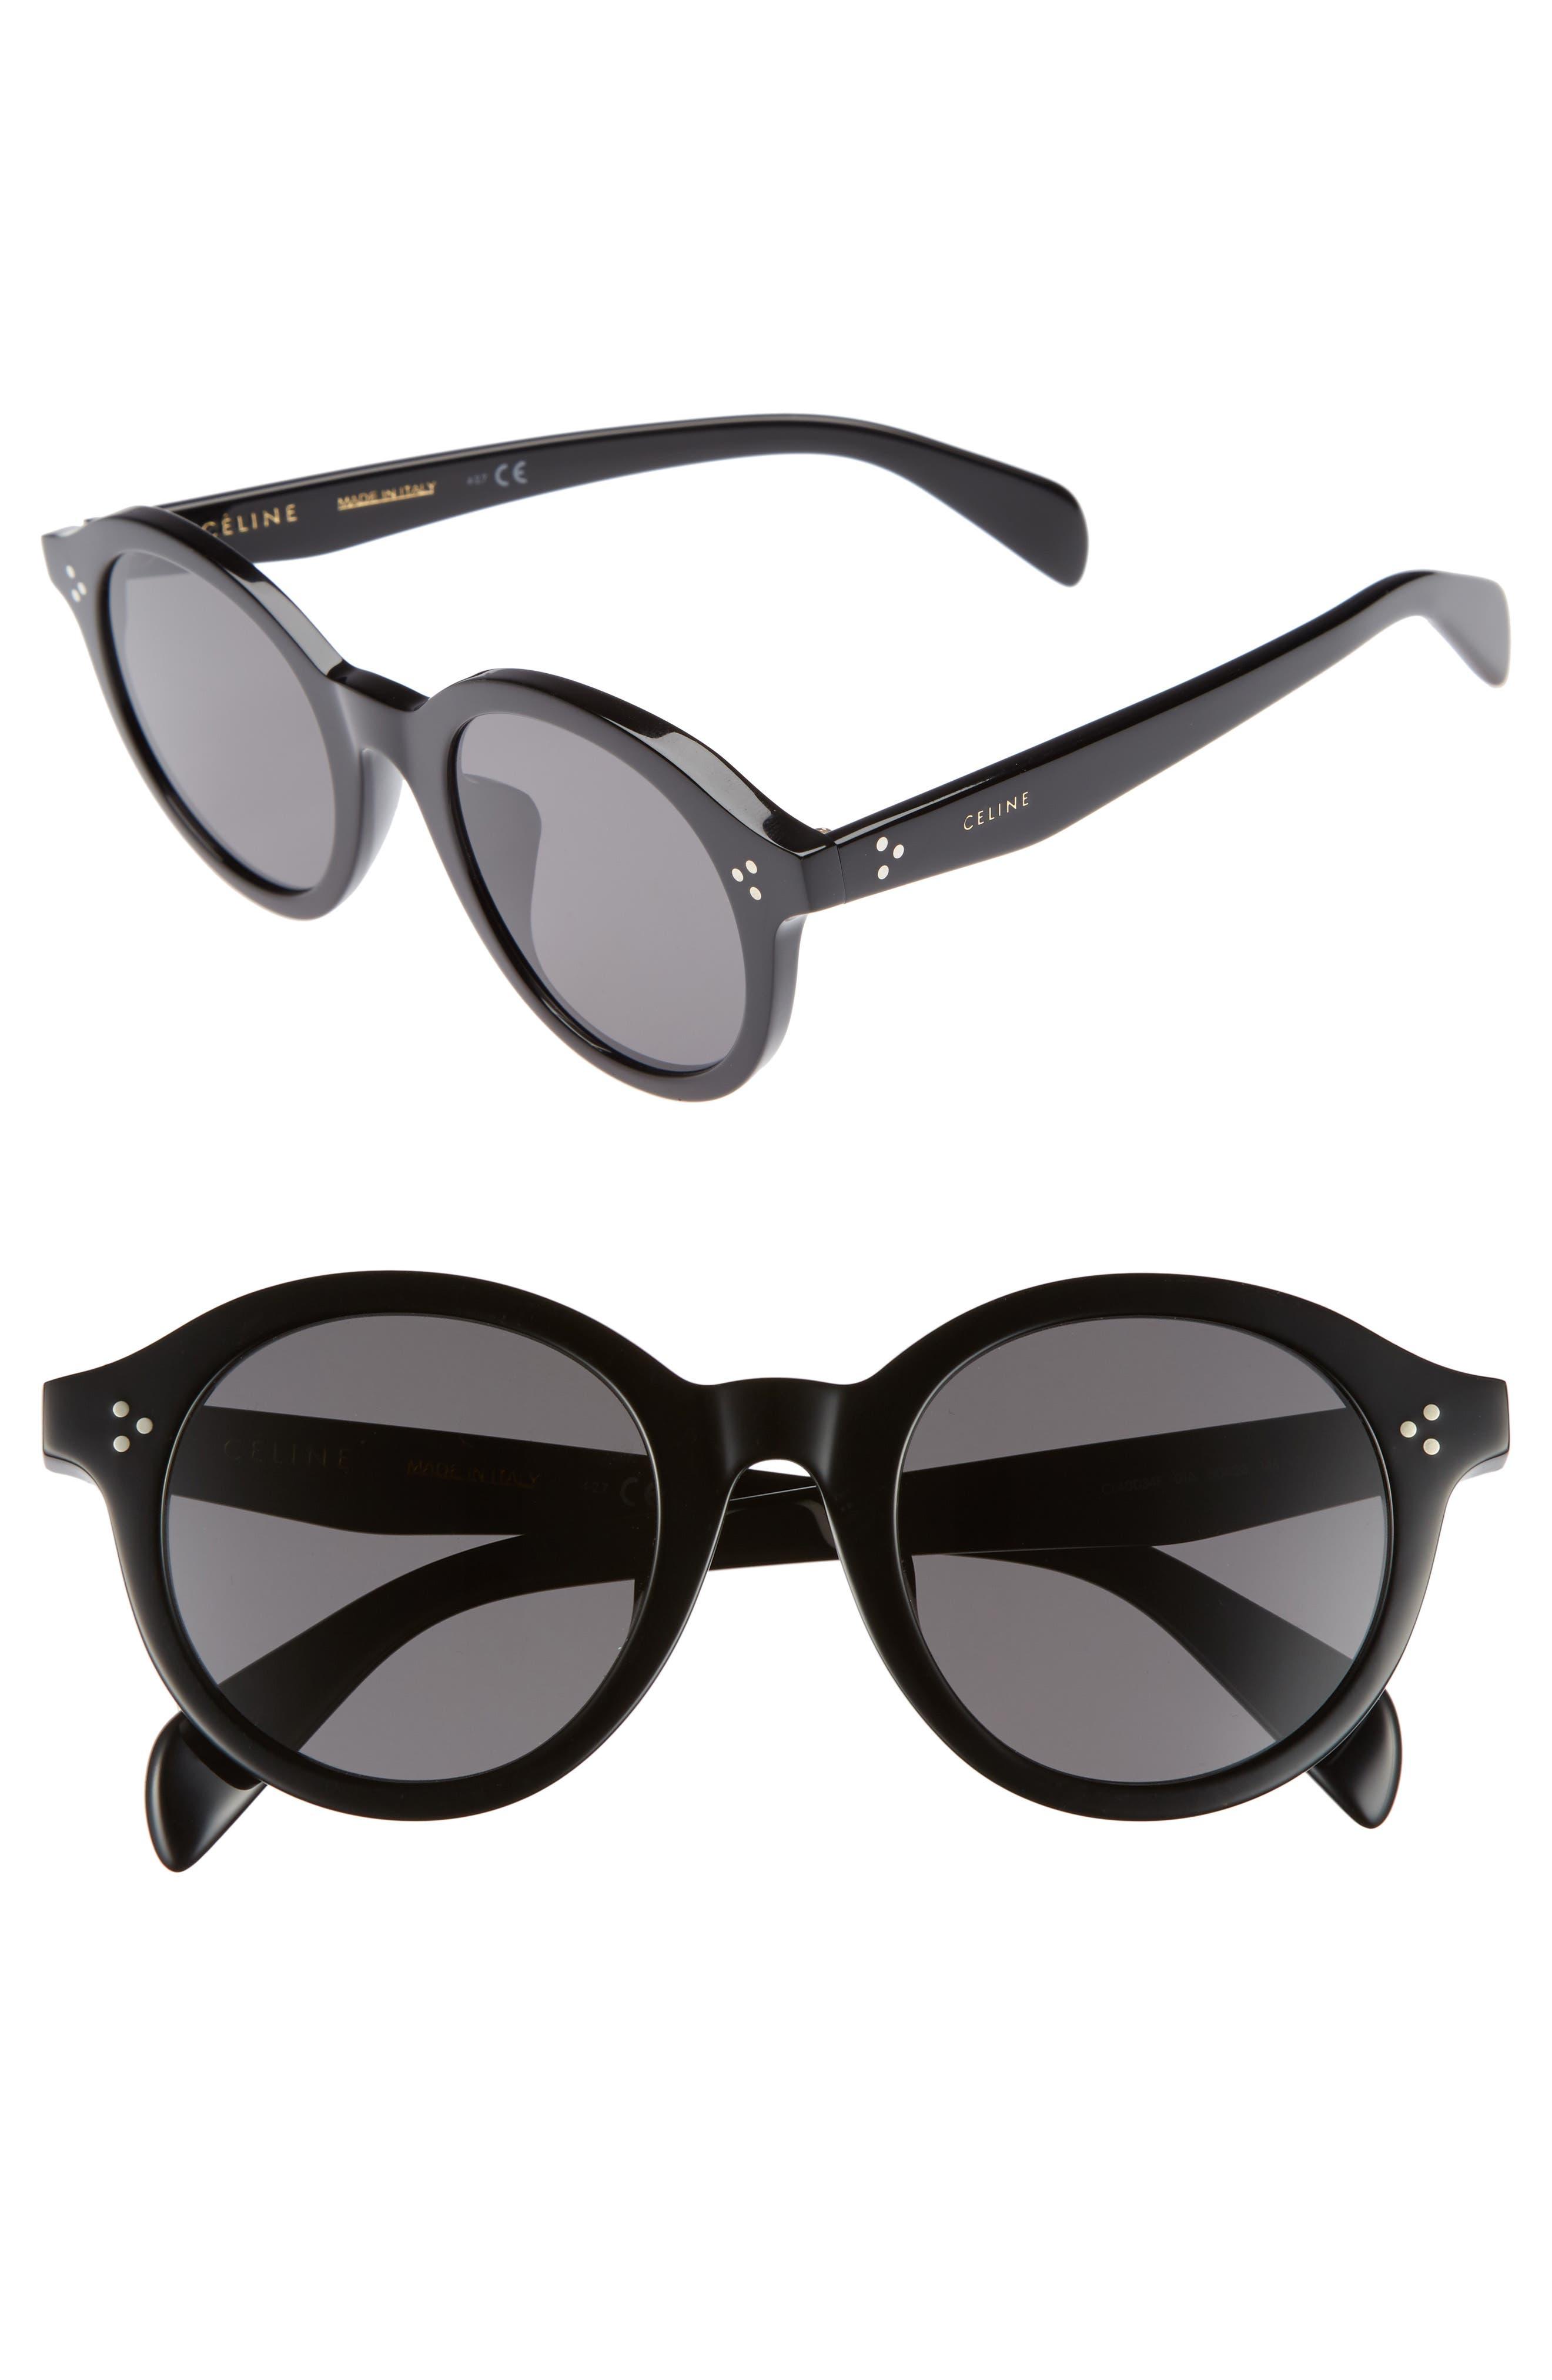 Céline Special Fit 50mm Round Sunglasses